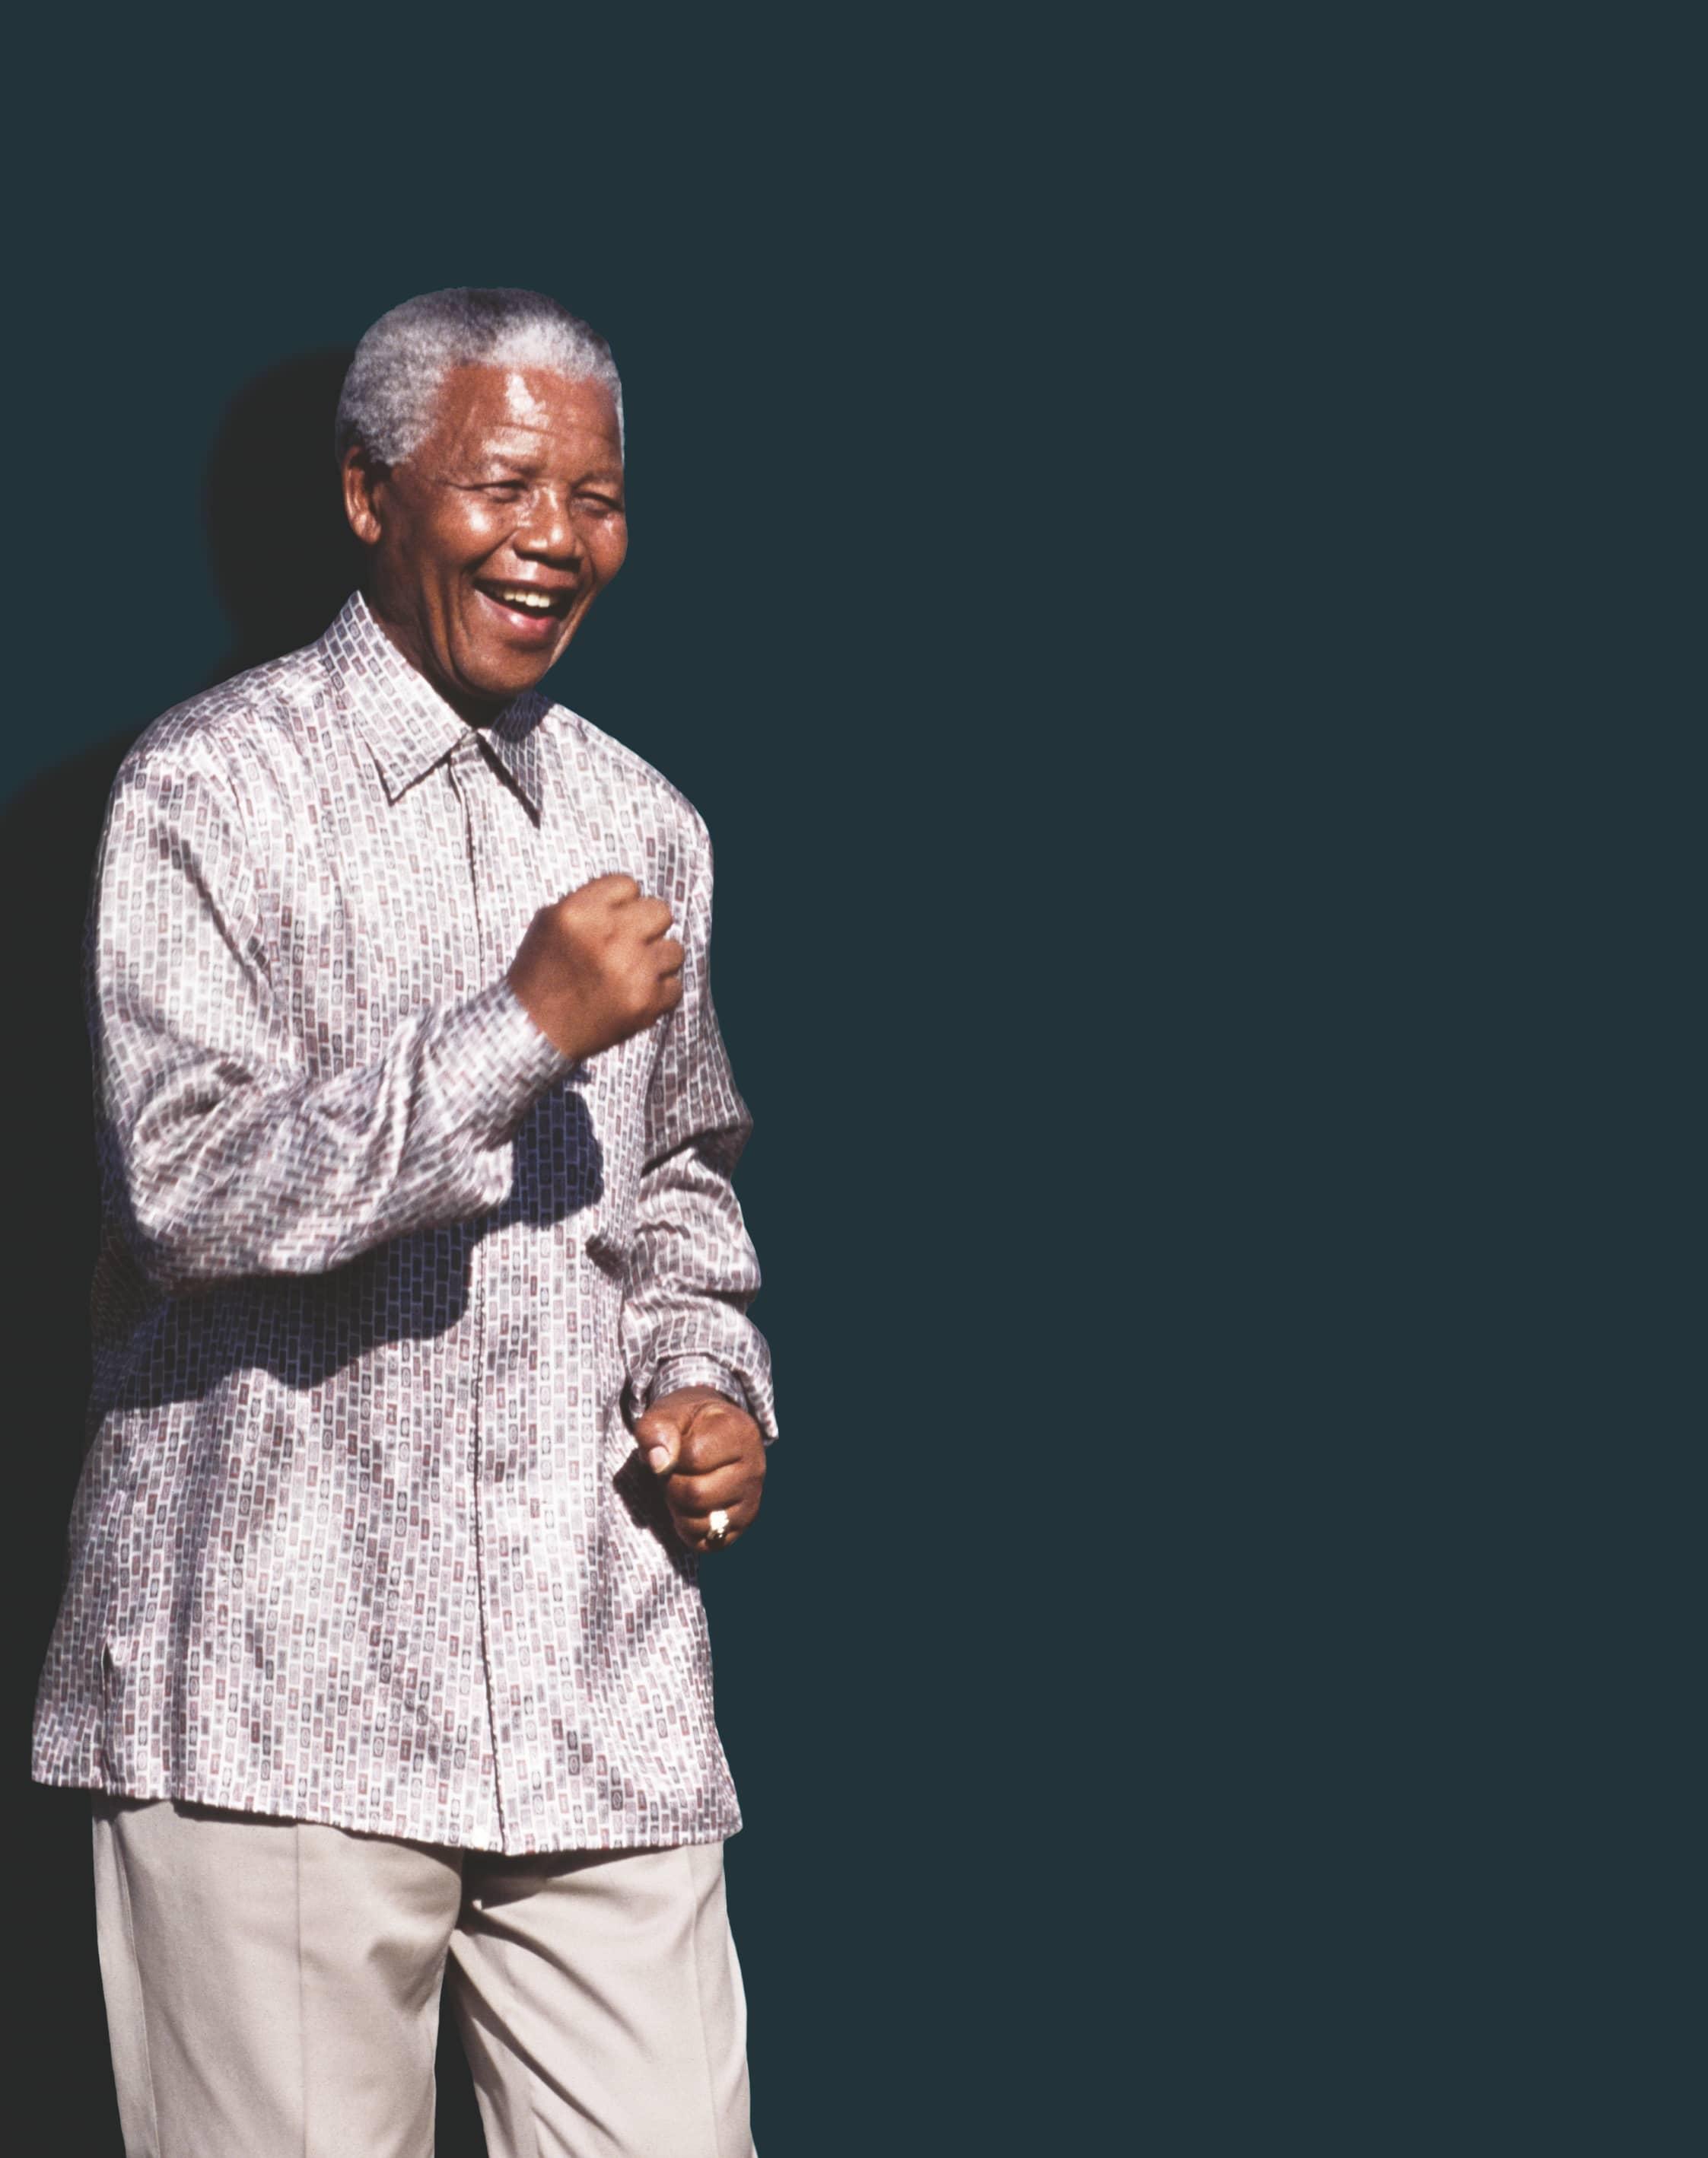 REMEMBERING NELSON MANDELA: SOUTH AFRICA'S GREATEST SON